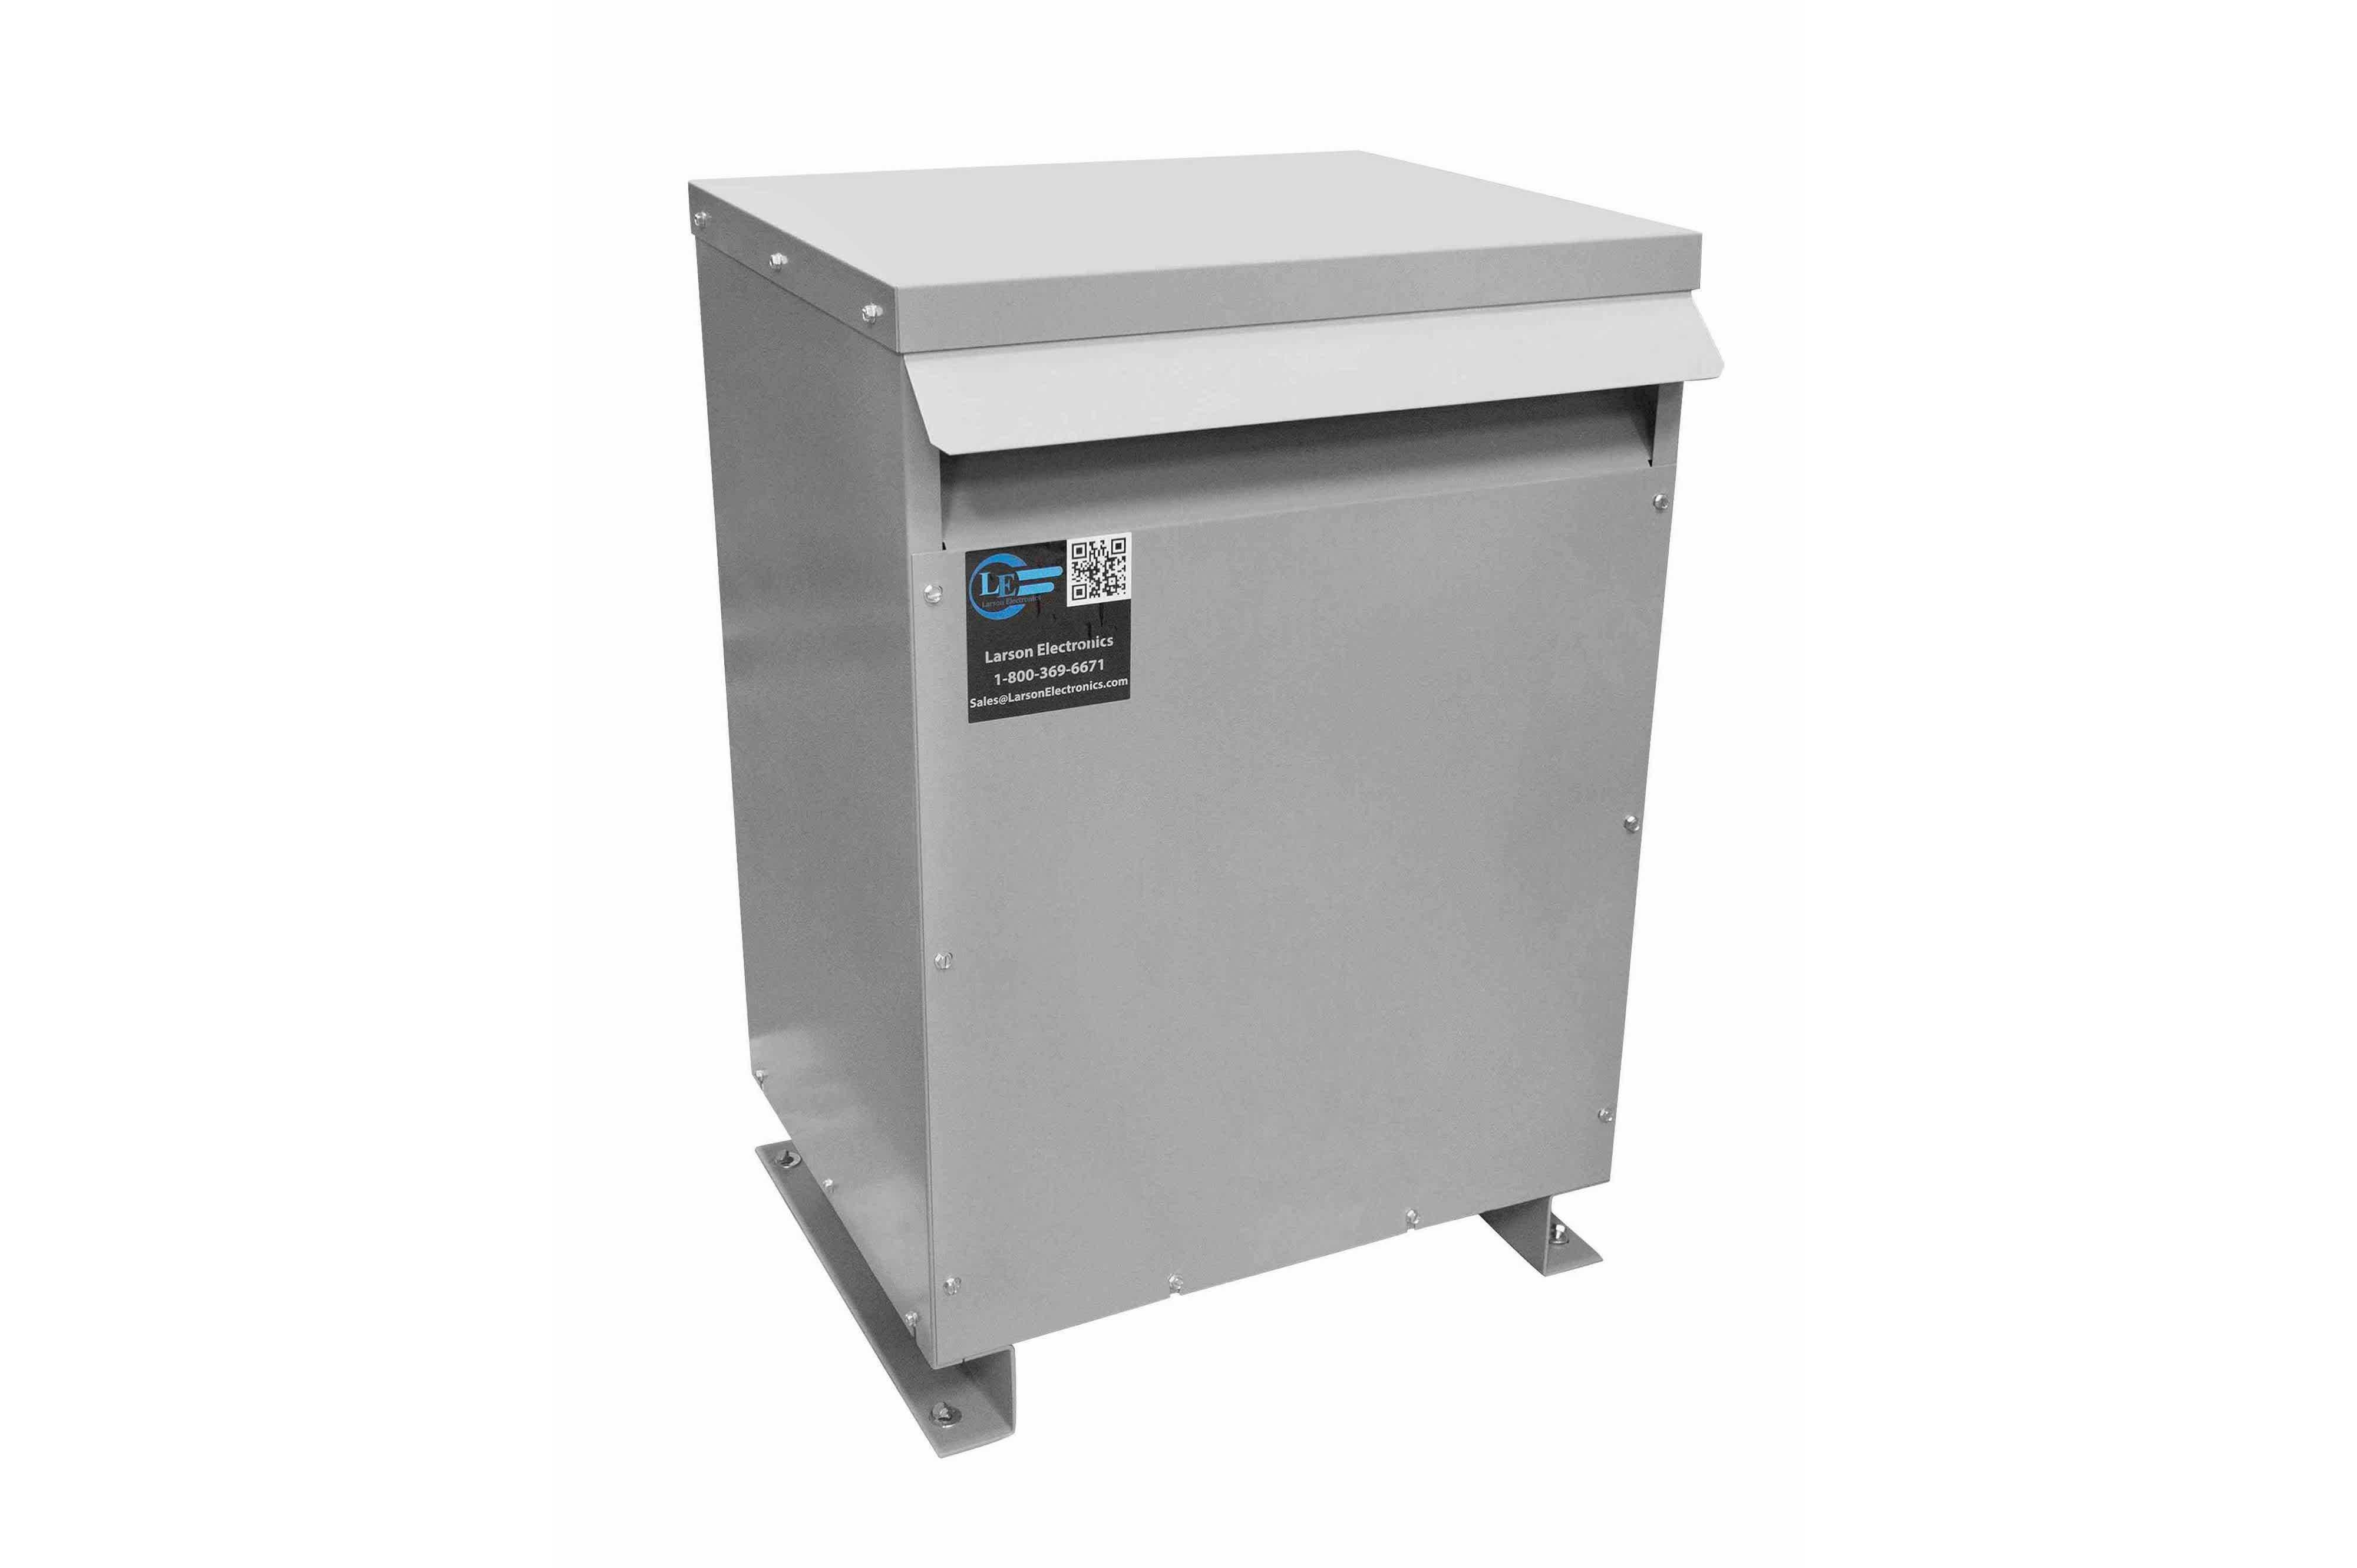 112.5 kVA 3PH DOE Transformer, 600V Delta Primary, 208Y/120 Wye-N Secondary, N3R, Ventilated, 60 Hz